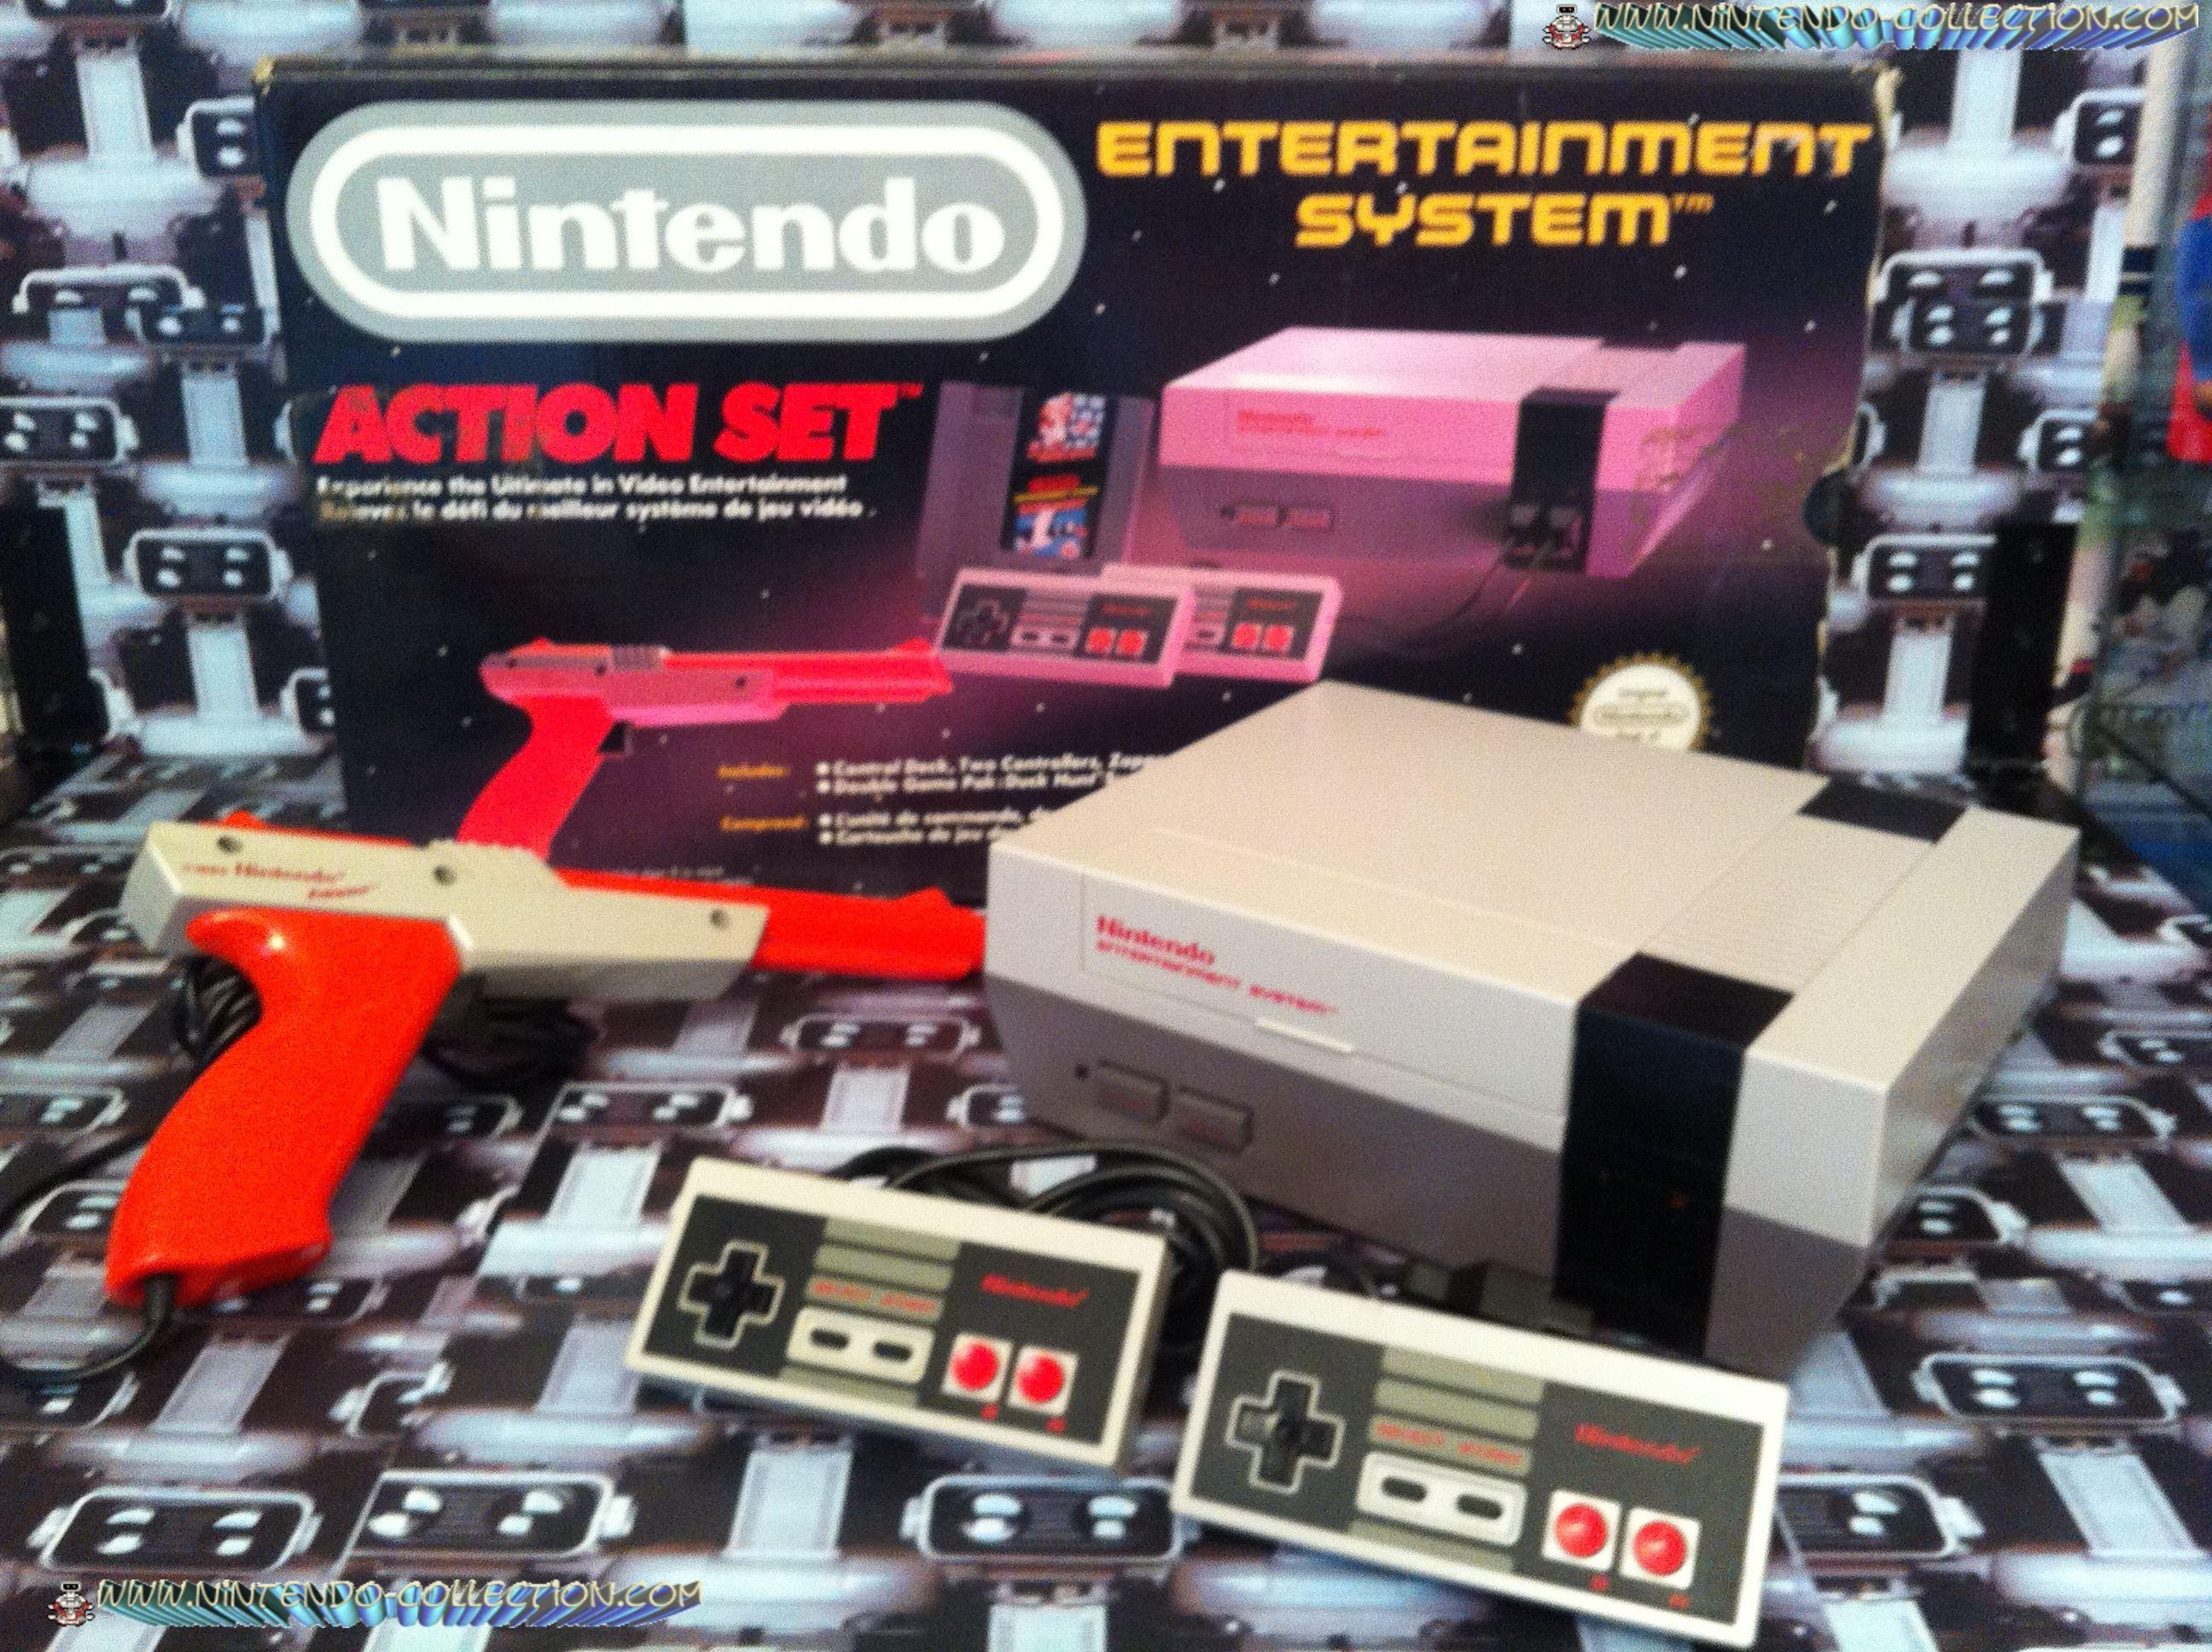 www.nintendo-collection.com - Nintendo NES Action Set Euro